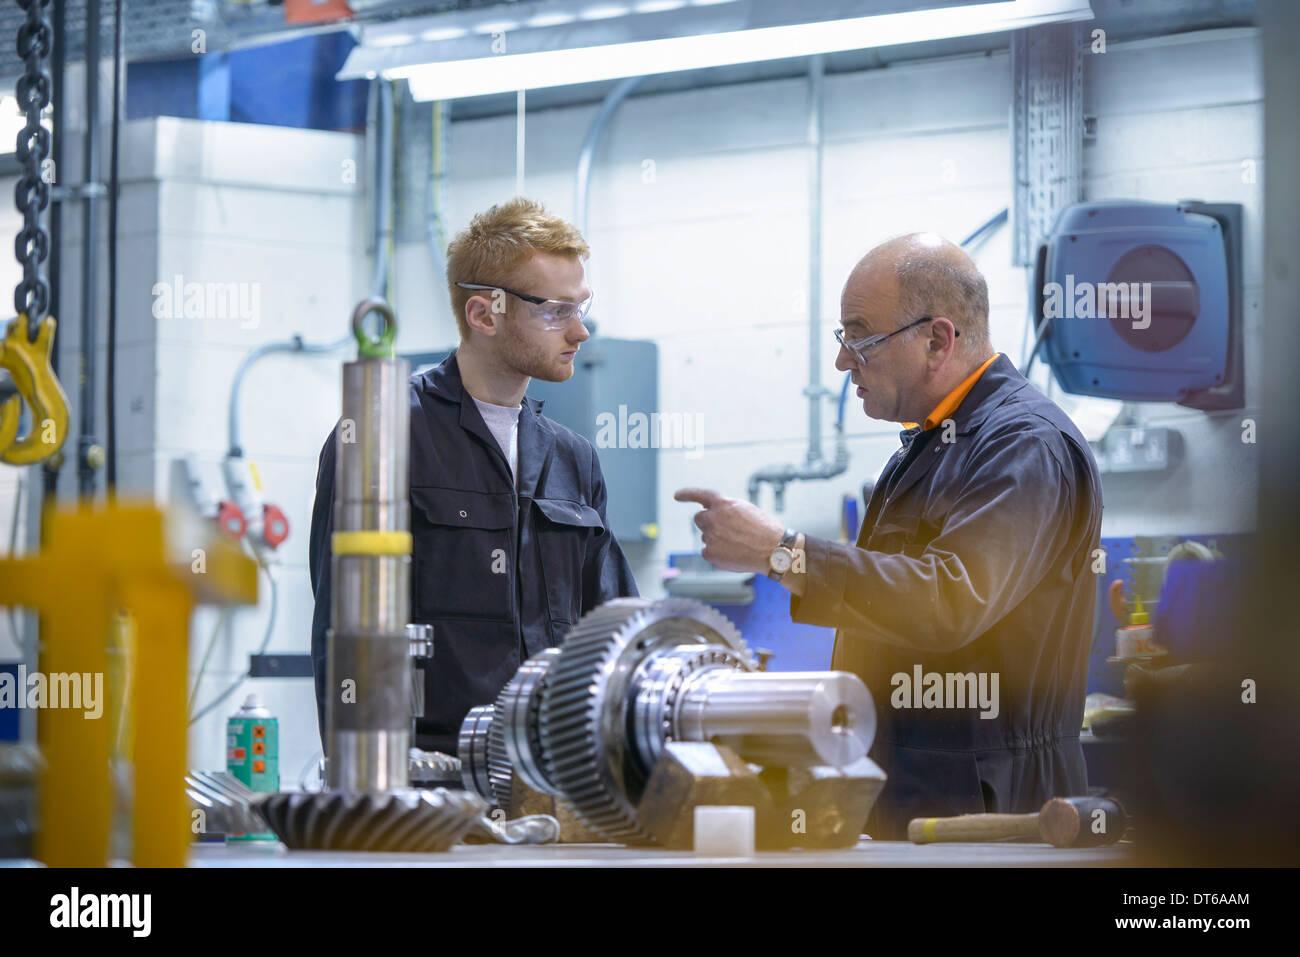 Ingegnere istruire apprendista a workstation in fabbrica Immagini Stock